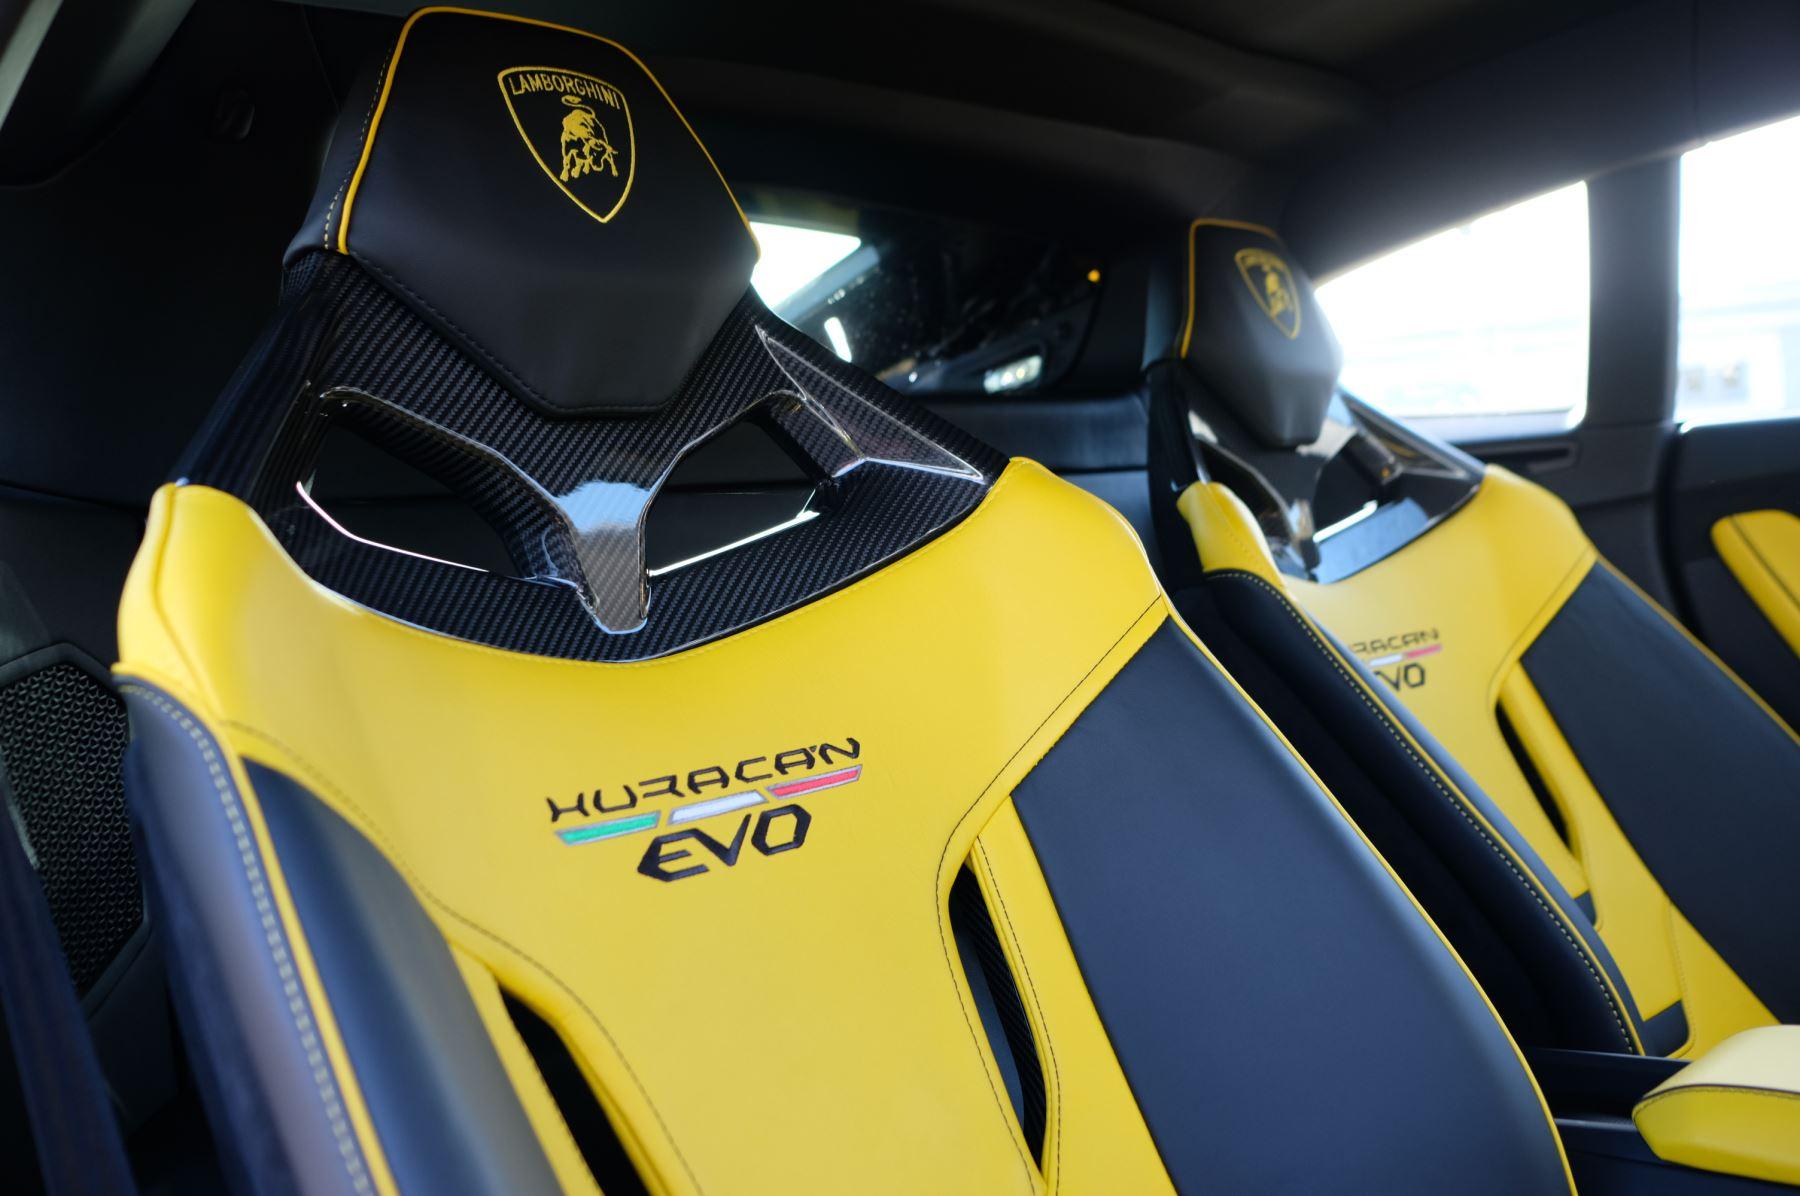 Lamborghini Huracan EVO 5.2 V10 610 2dr Auto RWD image 15